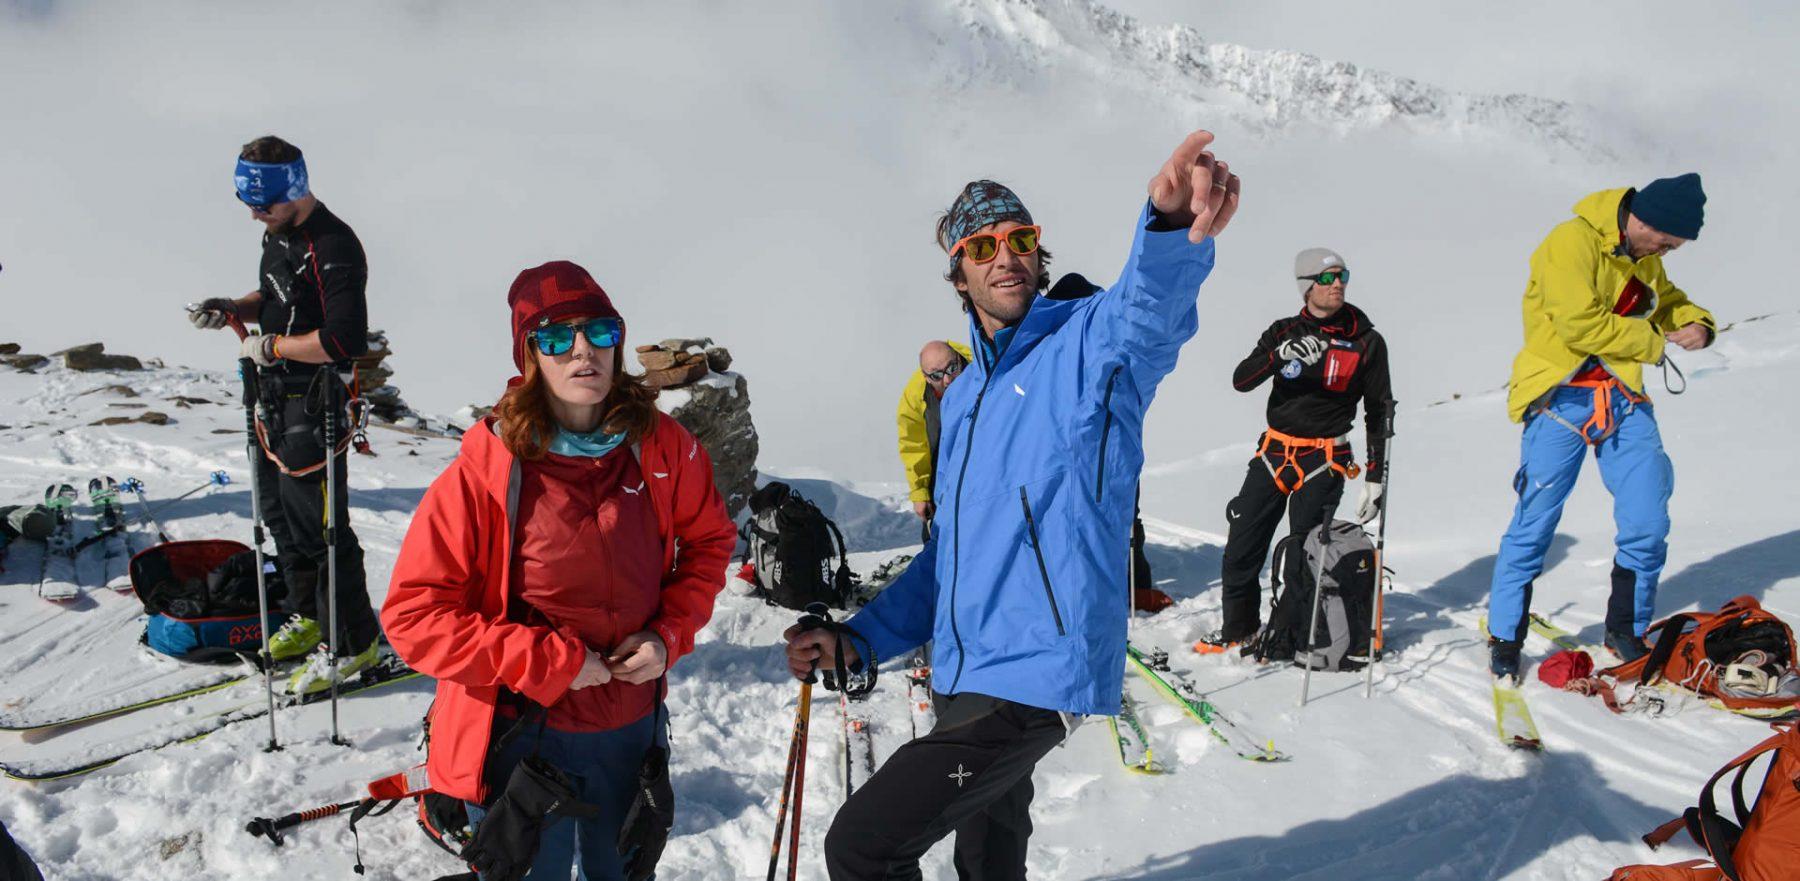 Matthias indica a Tatiana l'itinerario per la vetta